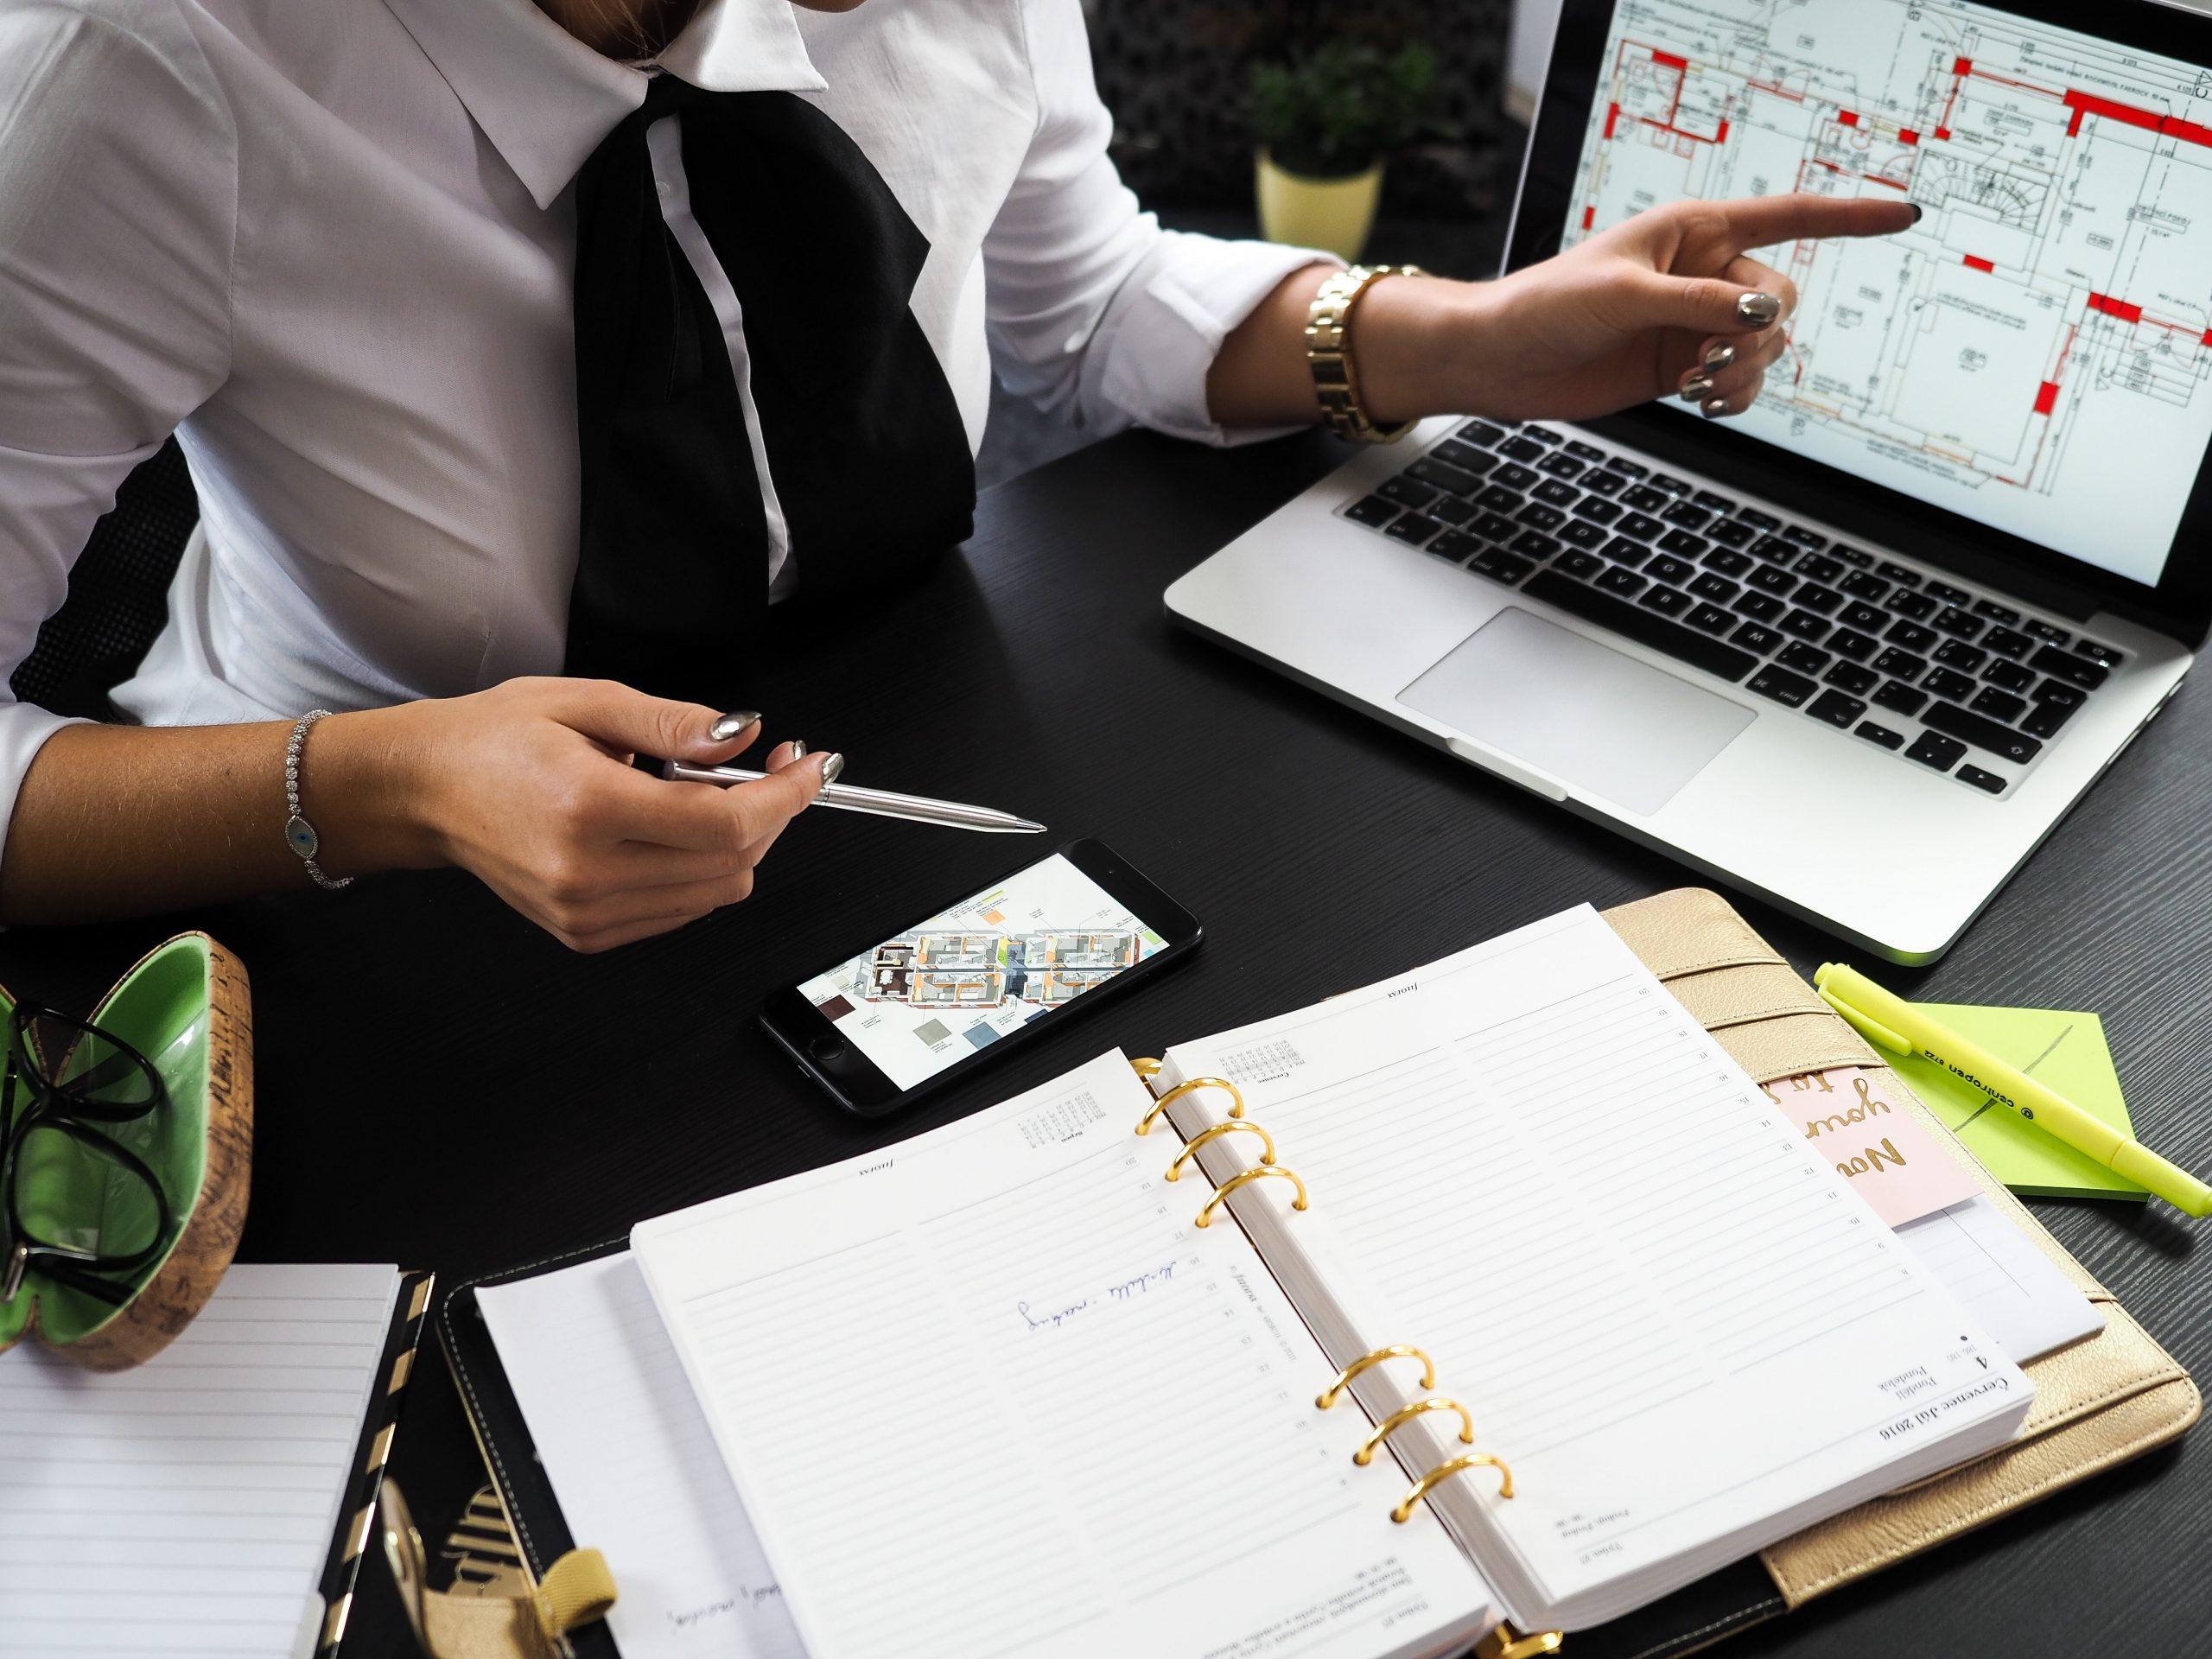 fastnet-service-facility-management-ingegneria-servizi